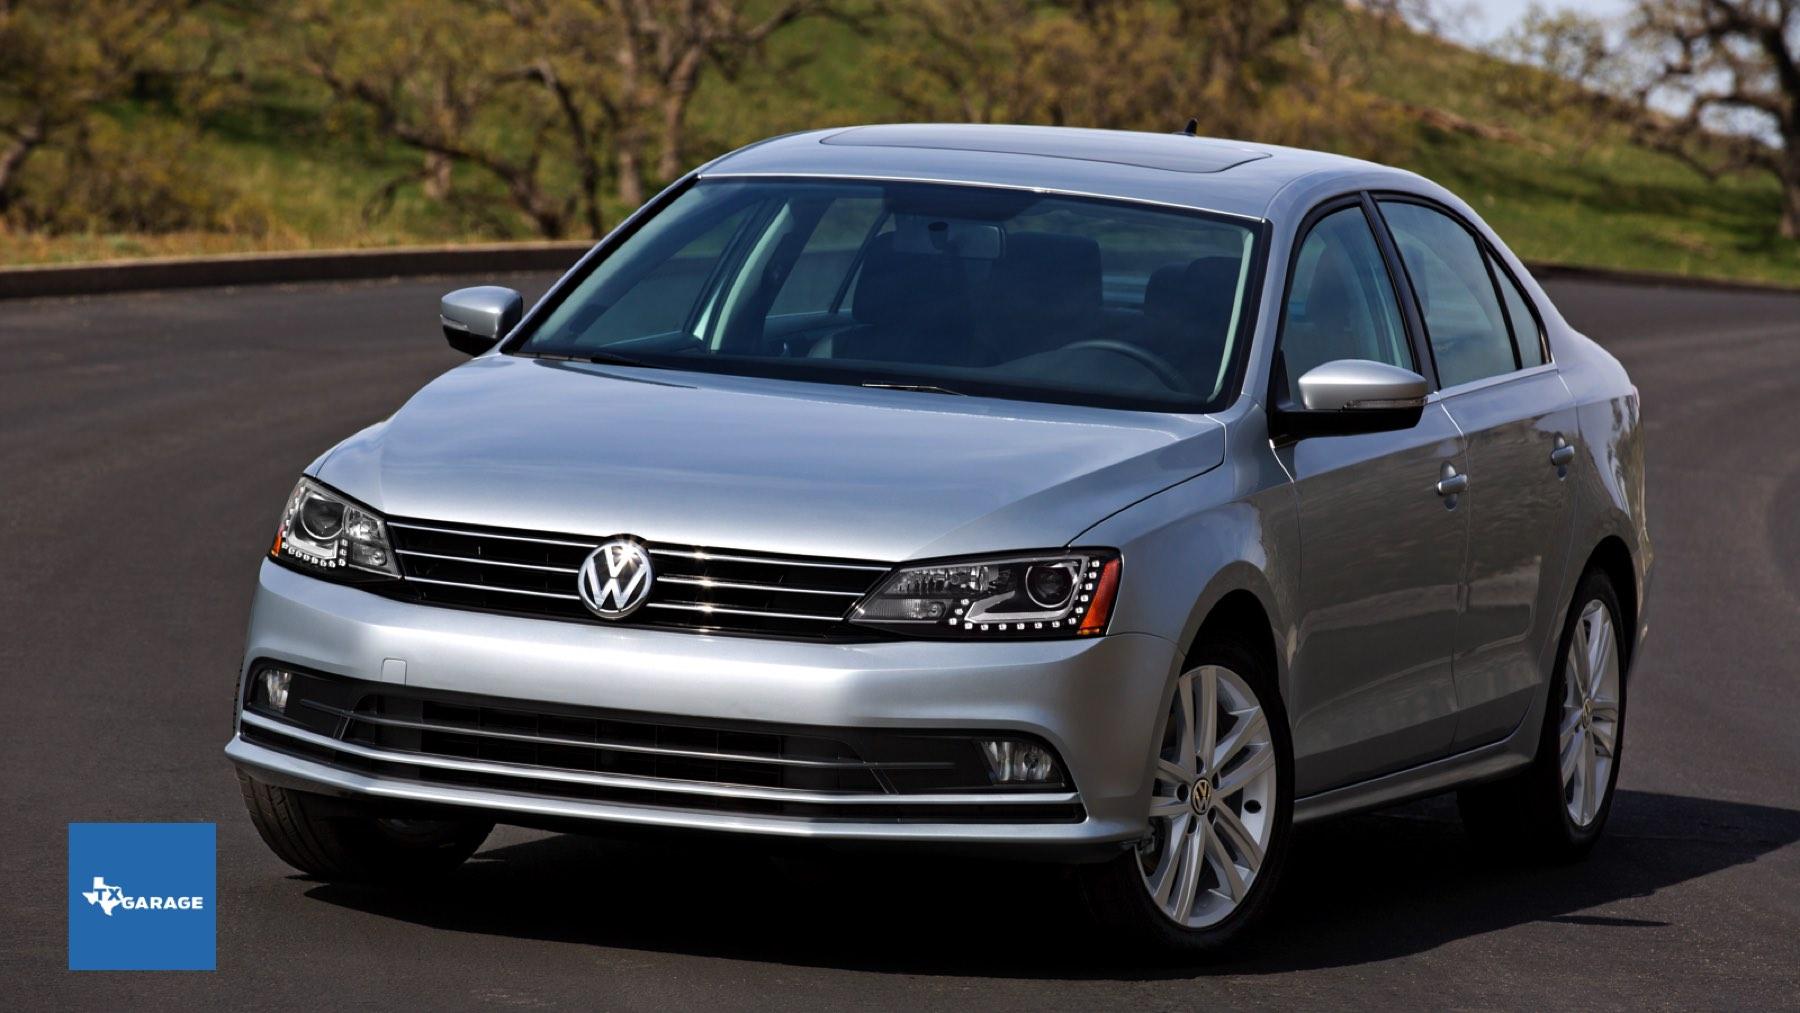 VW-03-txGarage